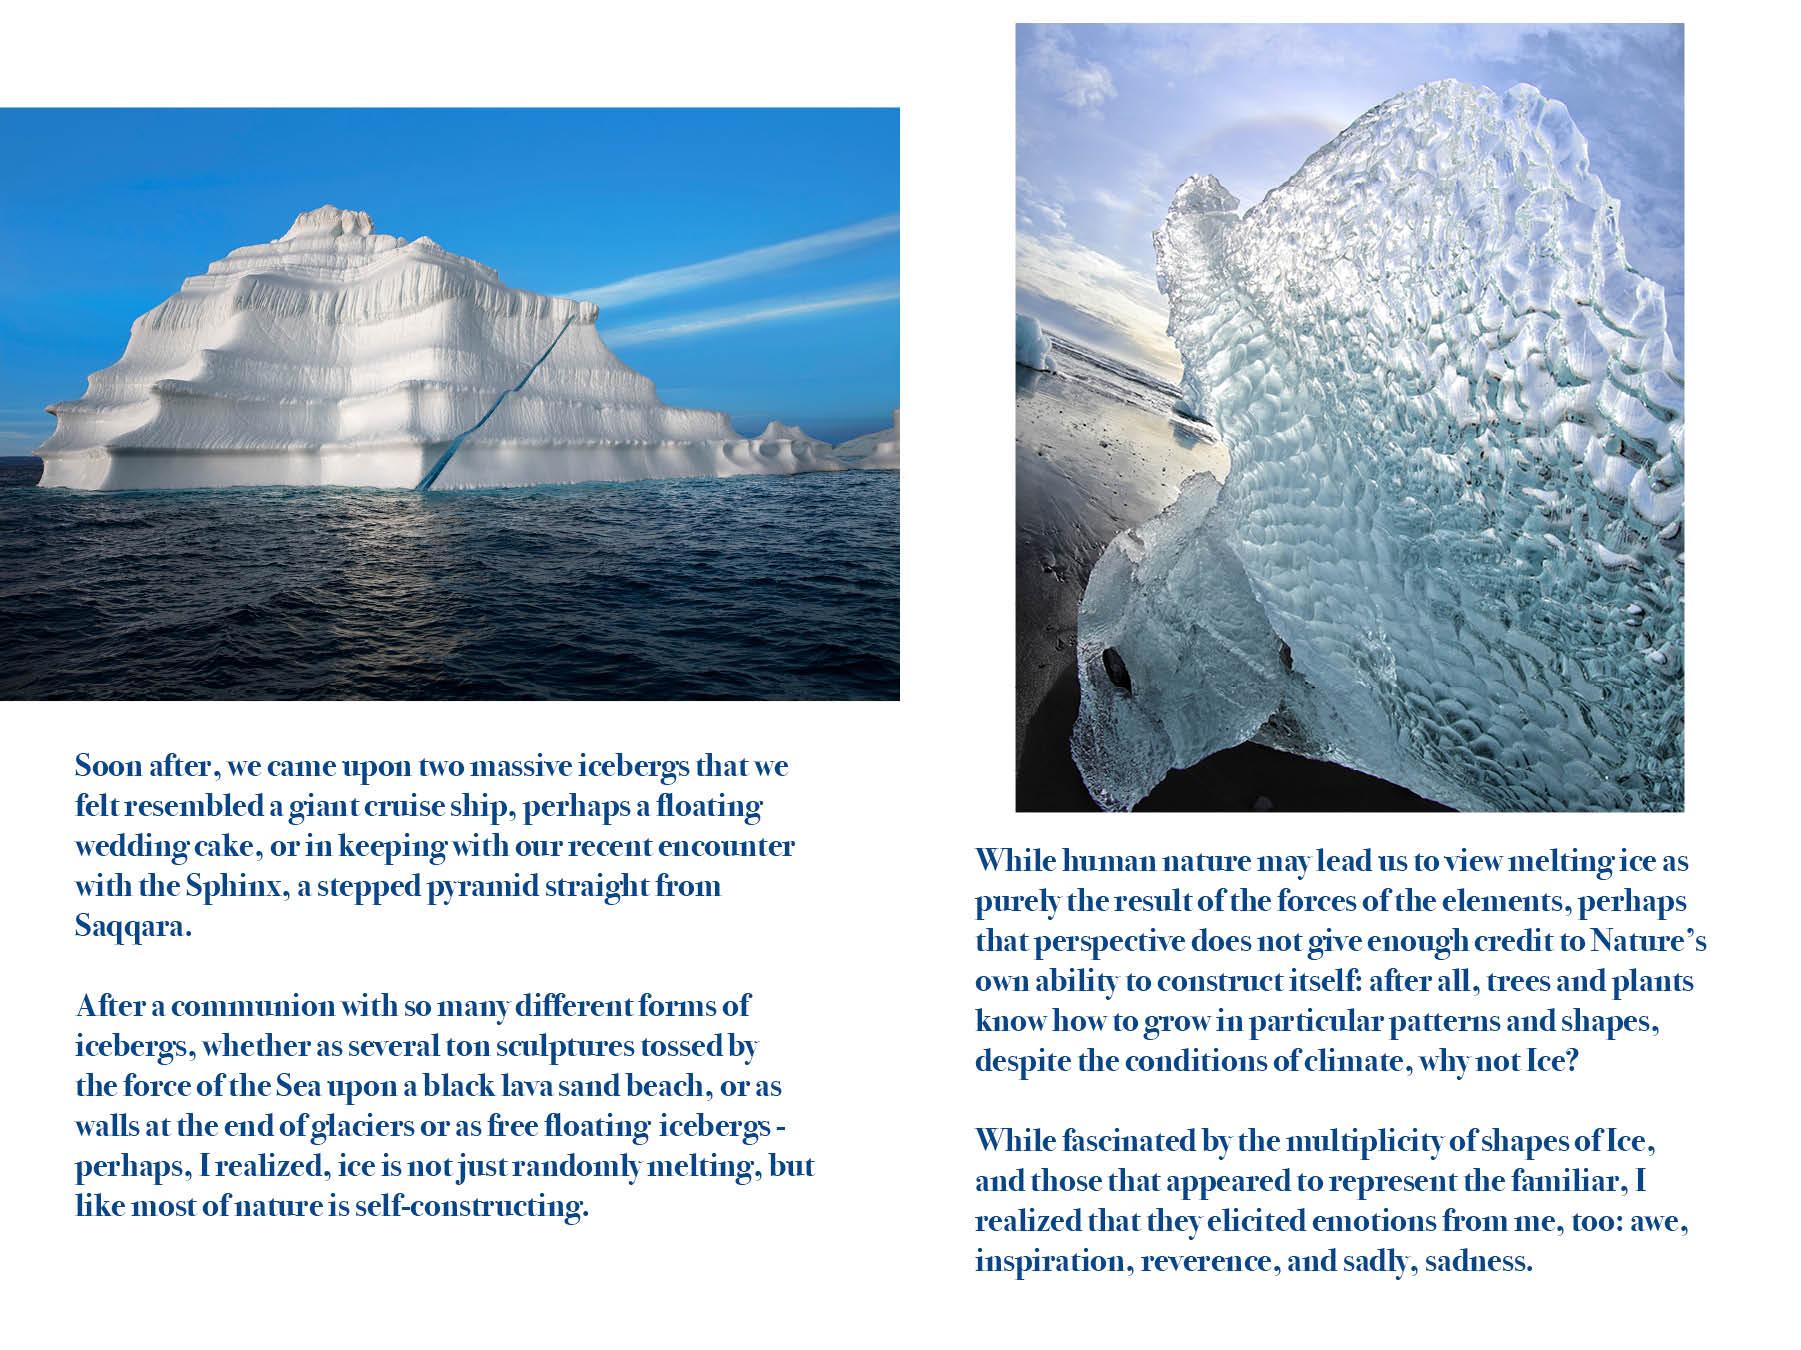 Sailing_Thru_Icebergs_article_7.jpg